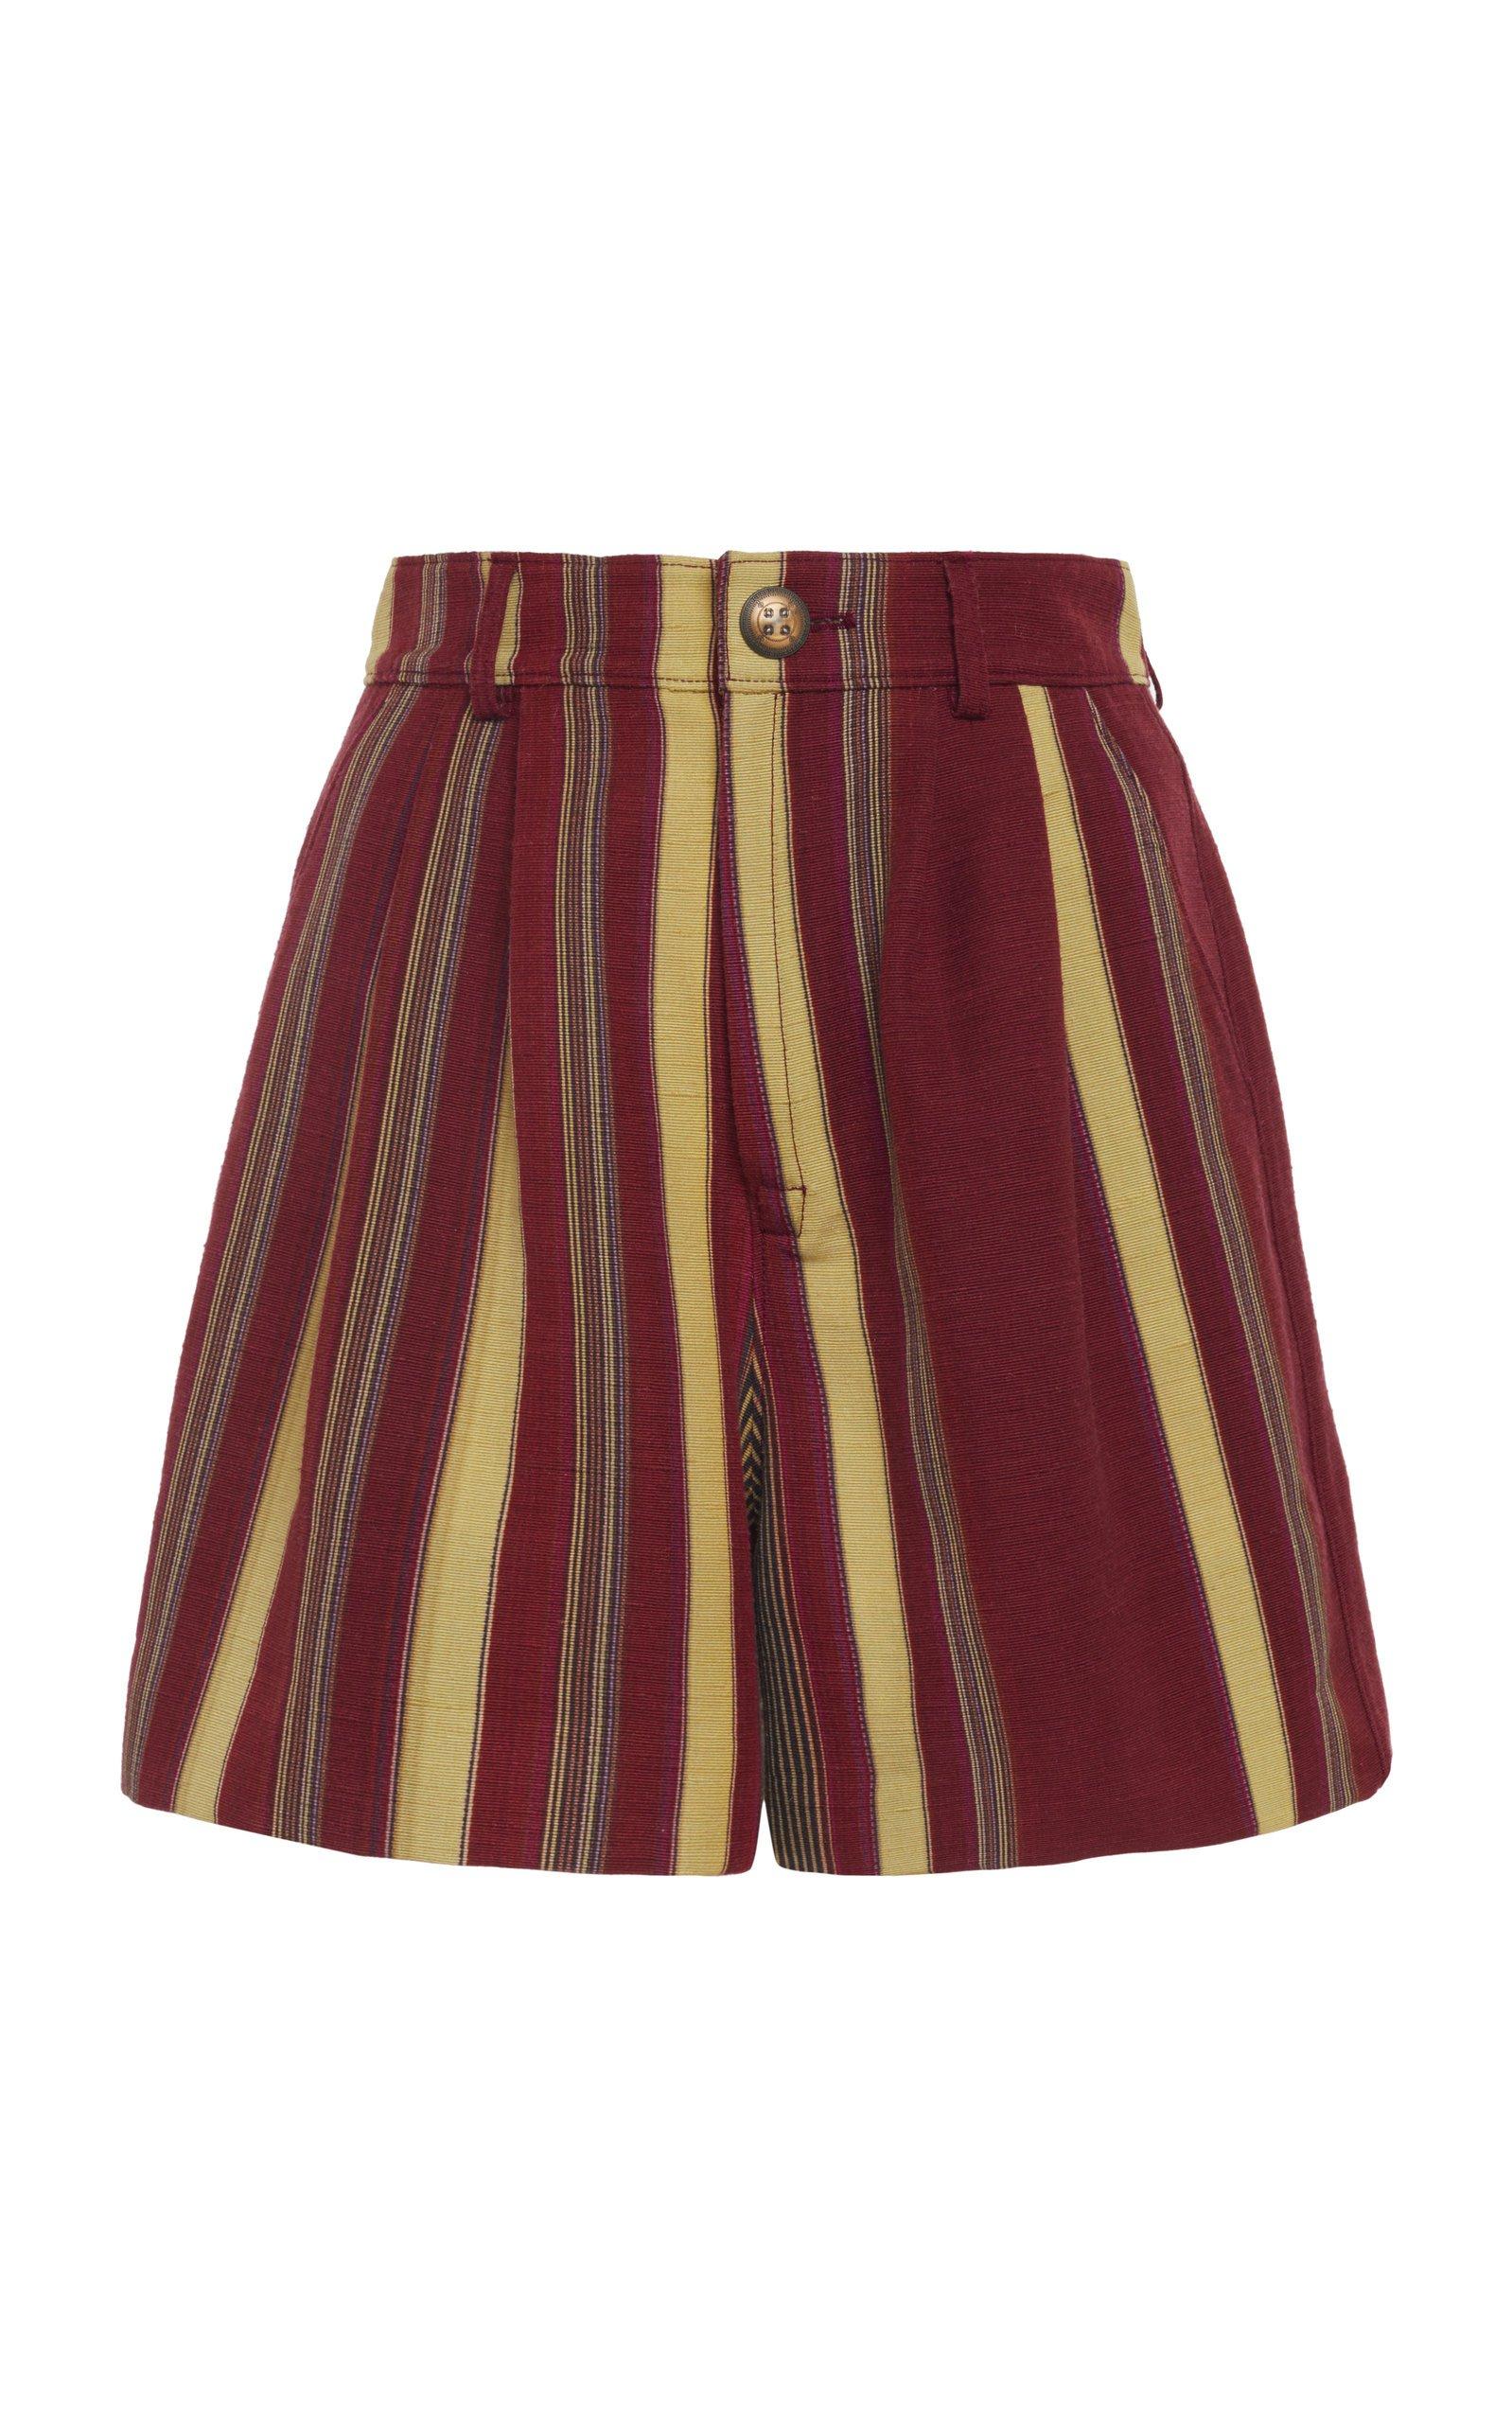 Etro Striped Silk-Blend Shorts Size: 42